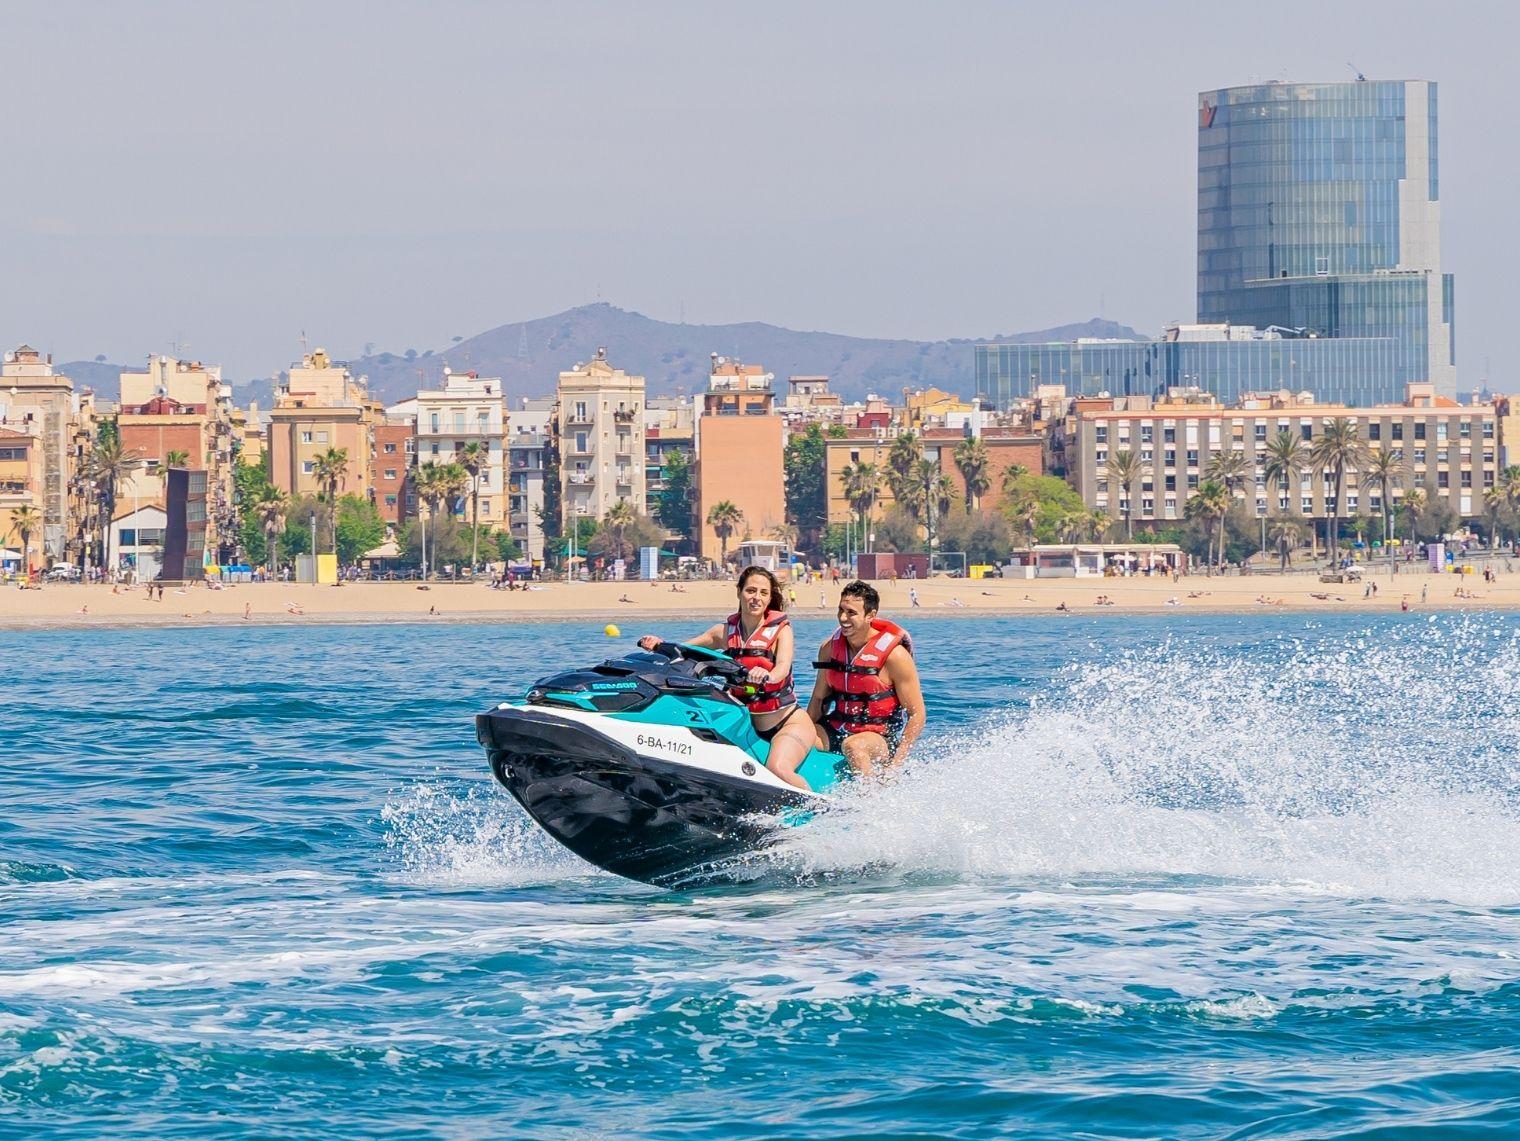 Enjoy Barcelona with a jet ski tour